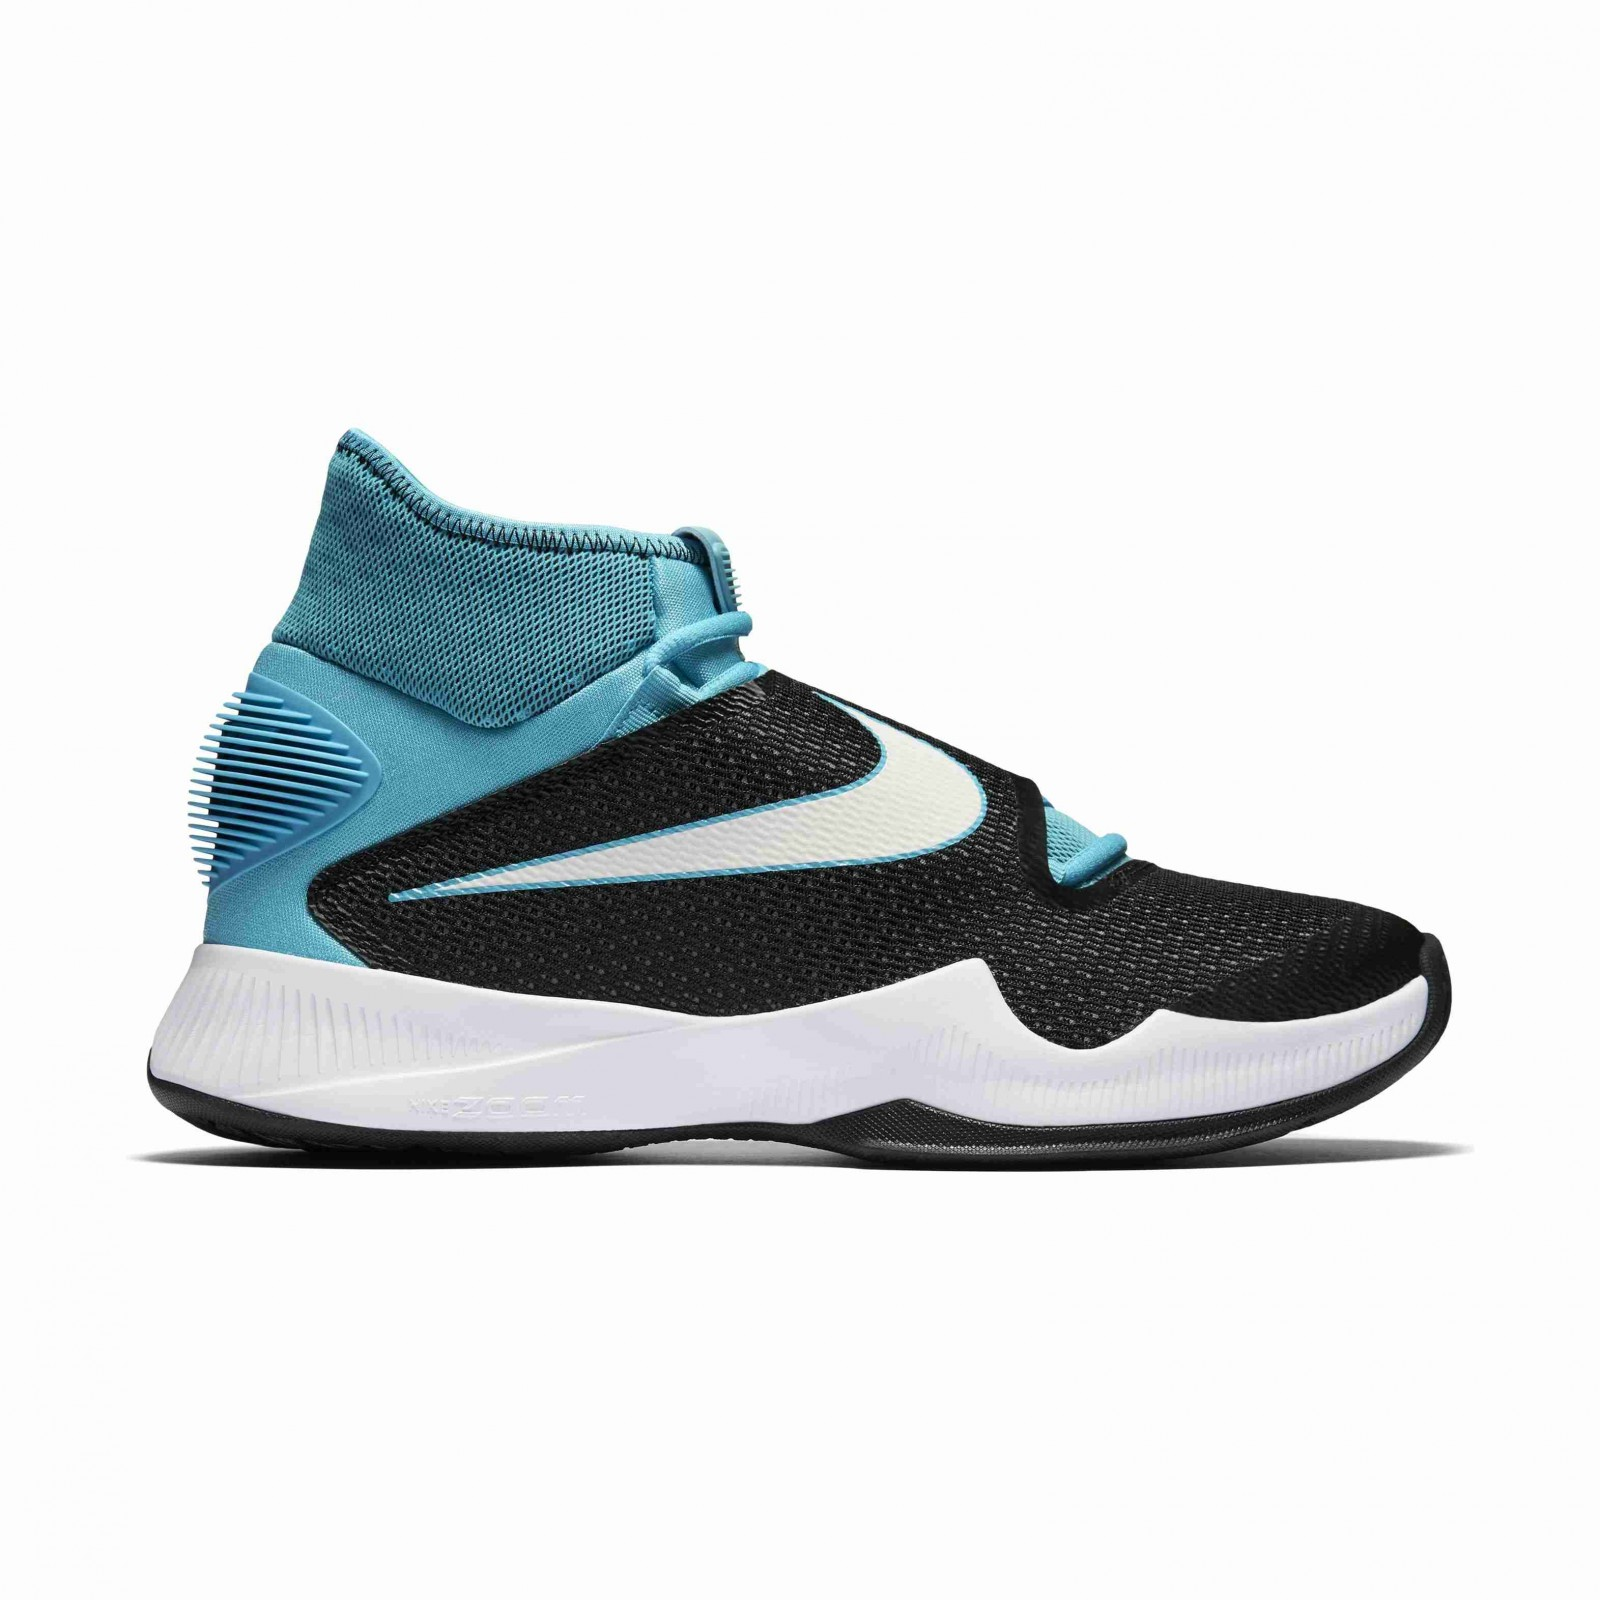 Pánské basketbalové boty Nike ZOOM HYPERREV 2016  16e40b06e9